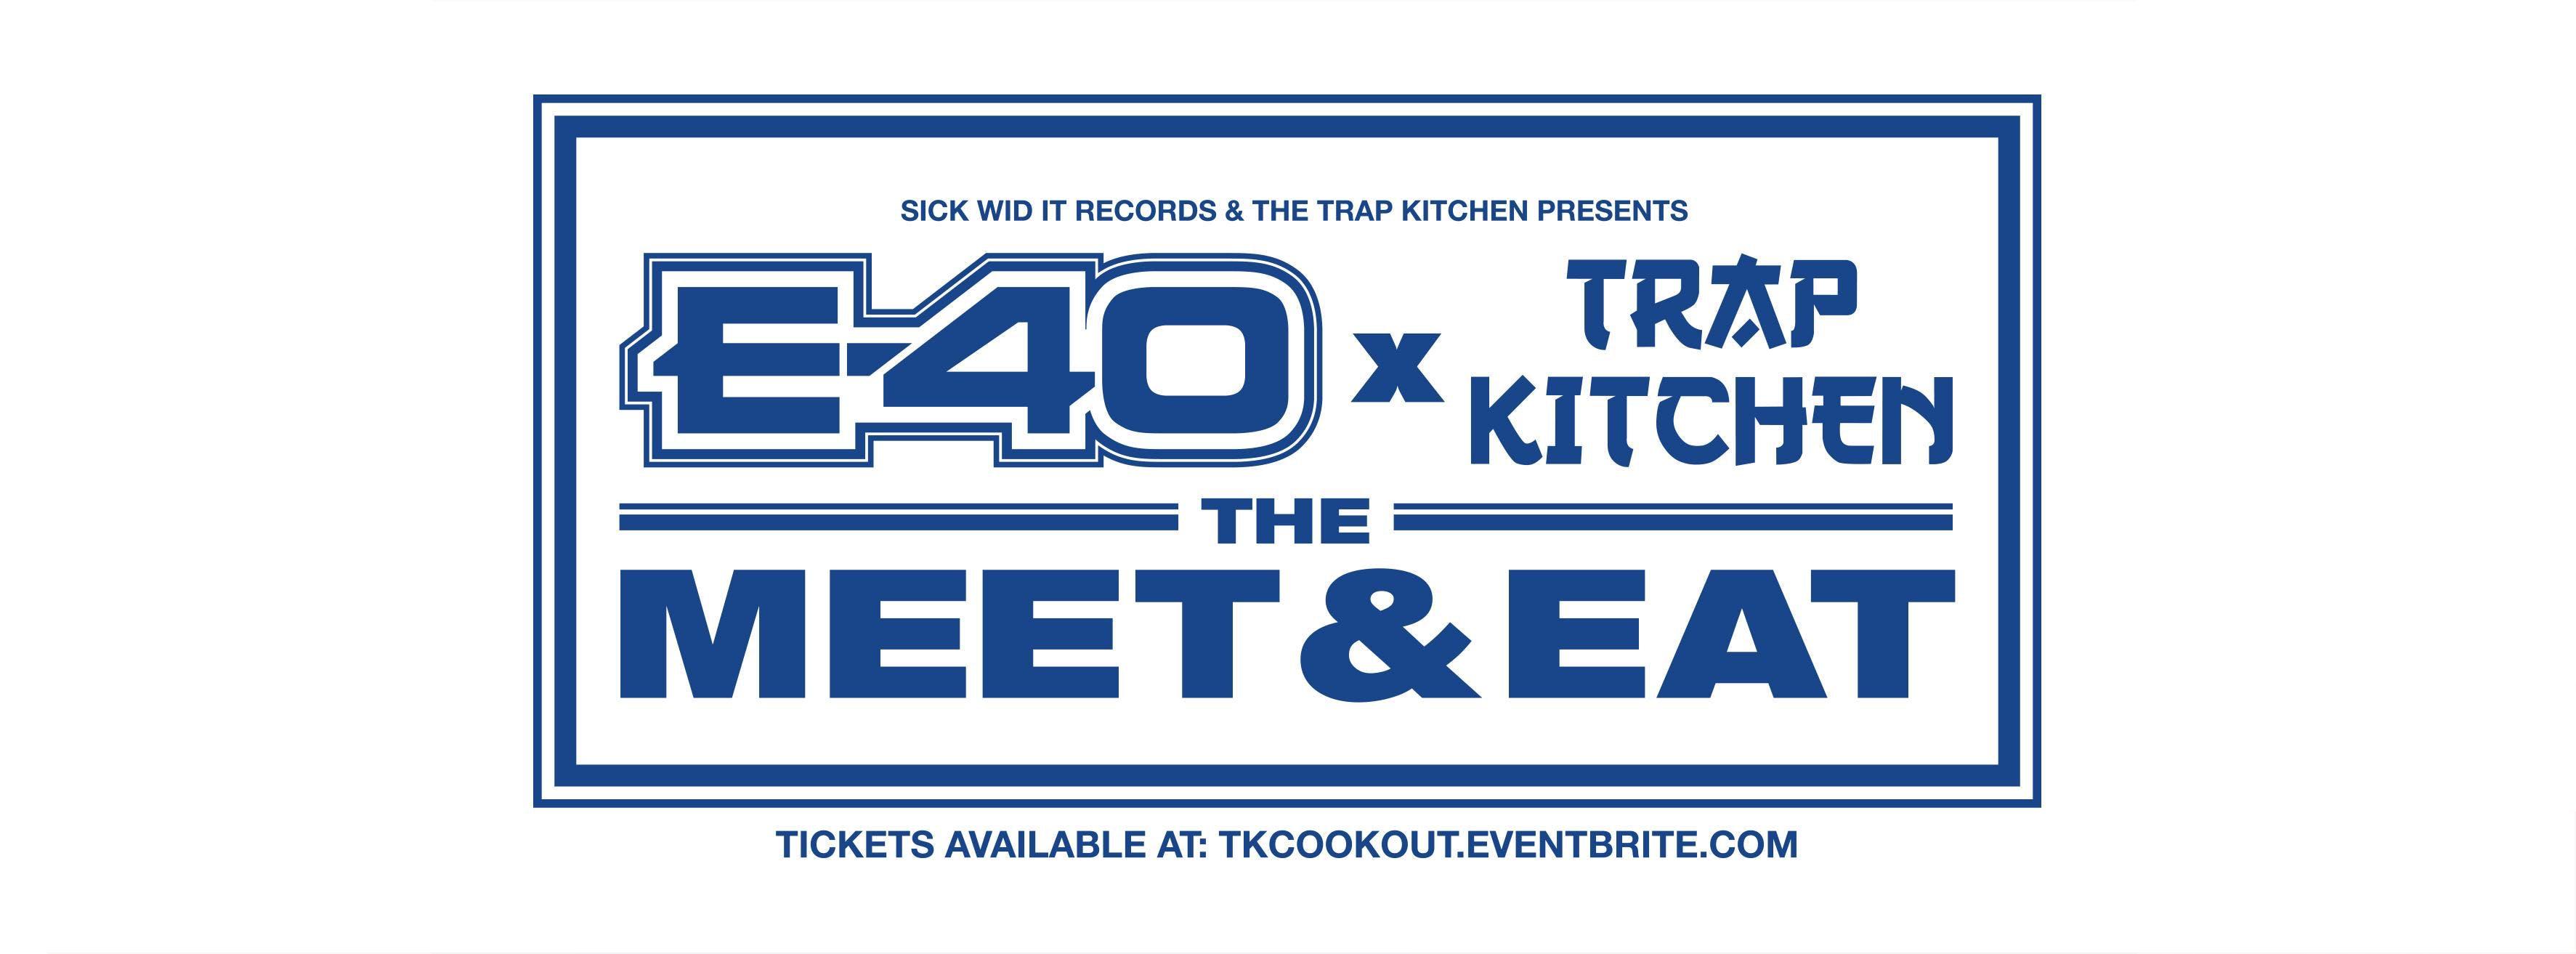 E-40 x Trap Kitchen \